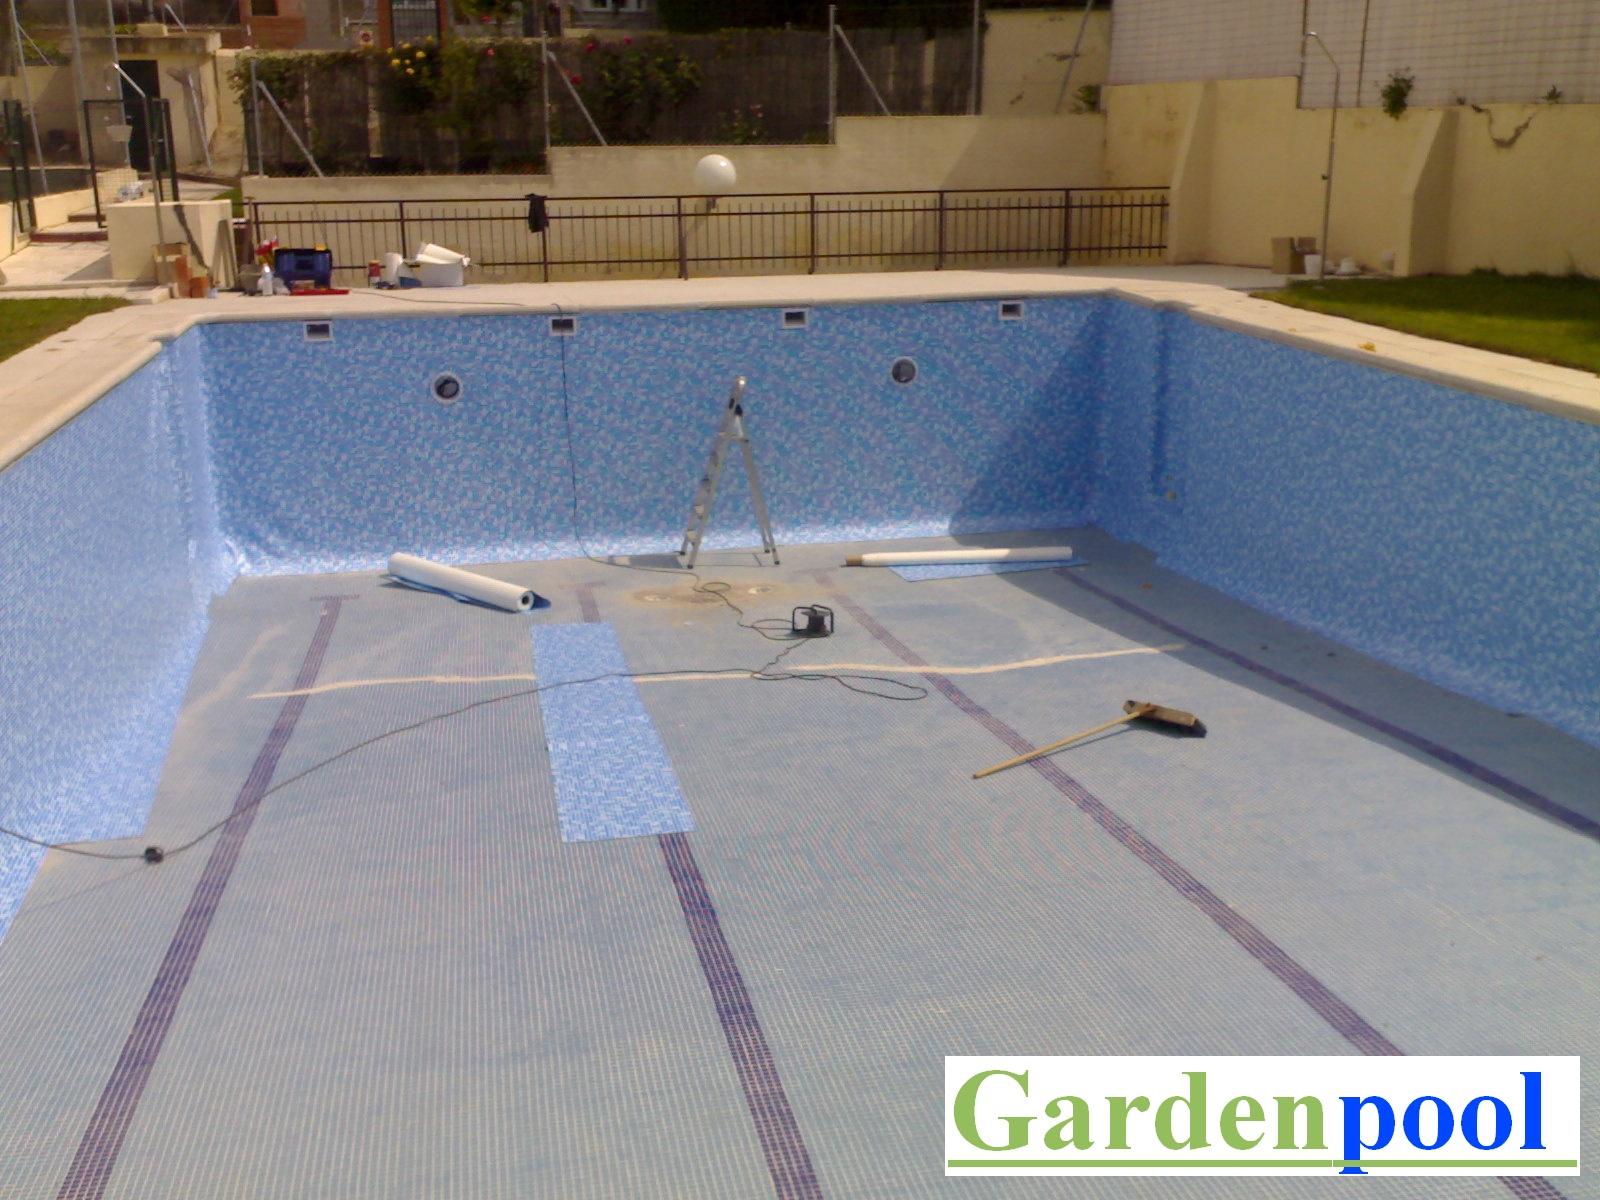 Empresa de rehabilitacion de piscinas madrid gardenpool - Piscina ajalvir ...